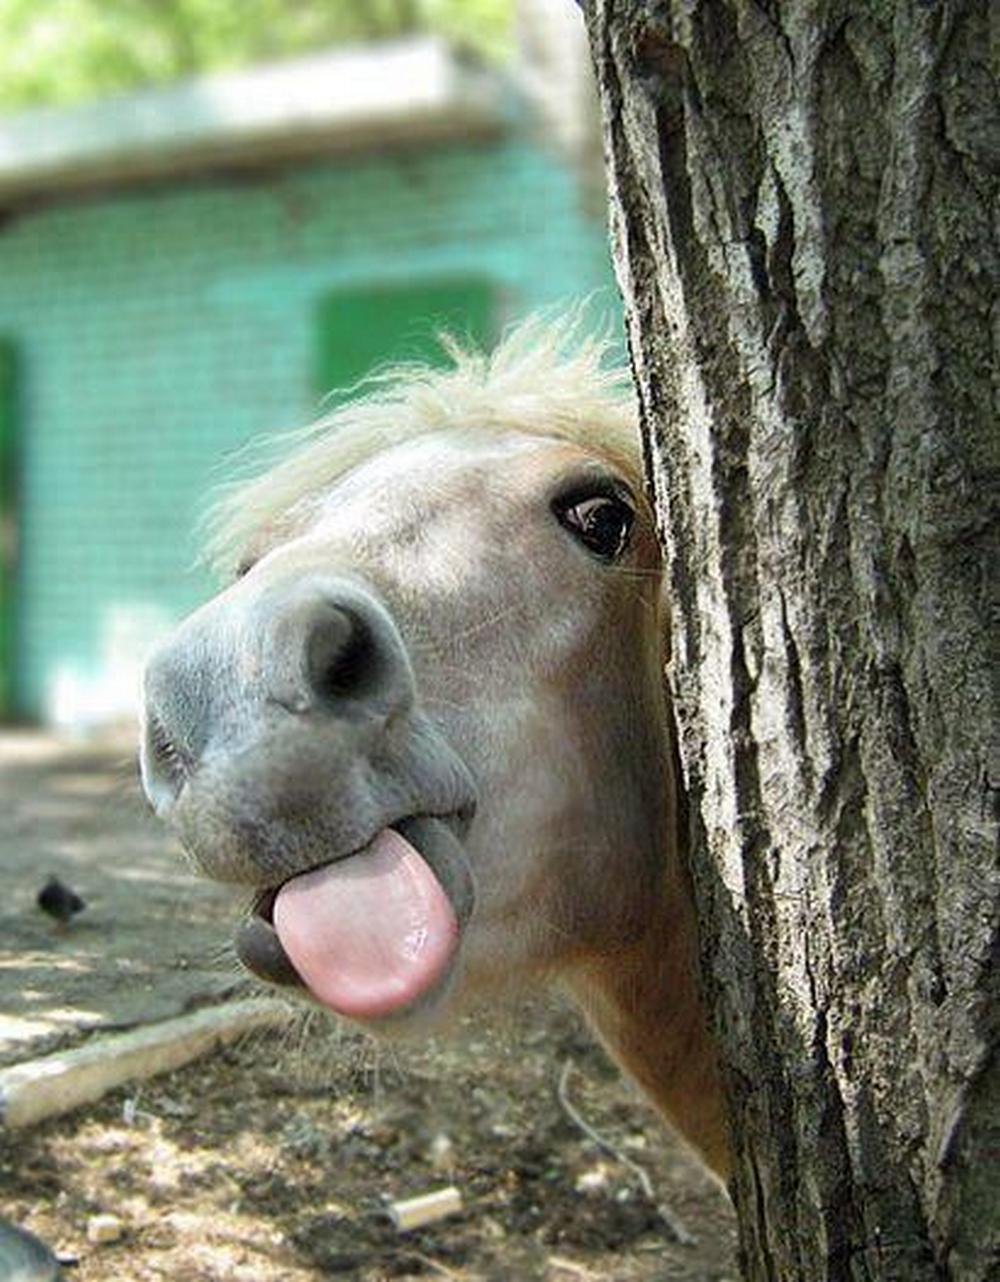 funyn horse tongue